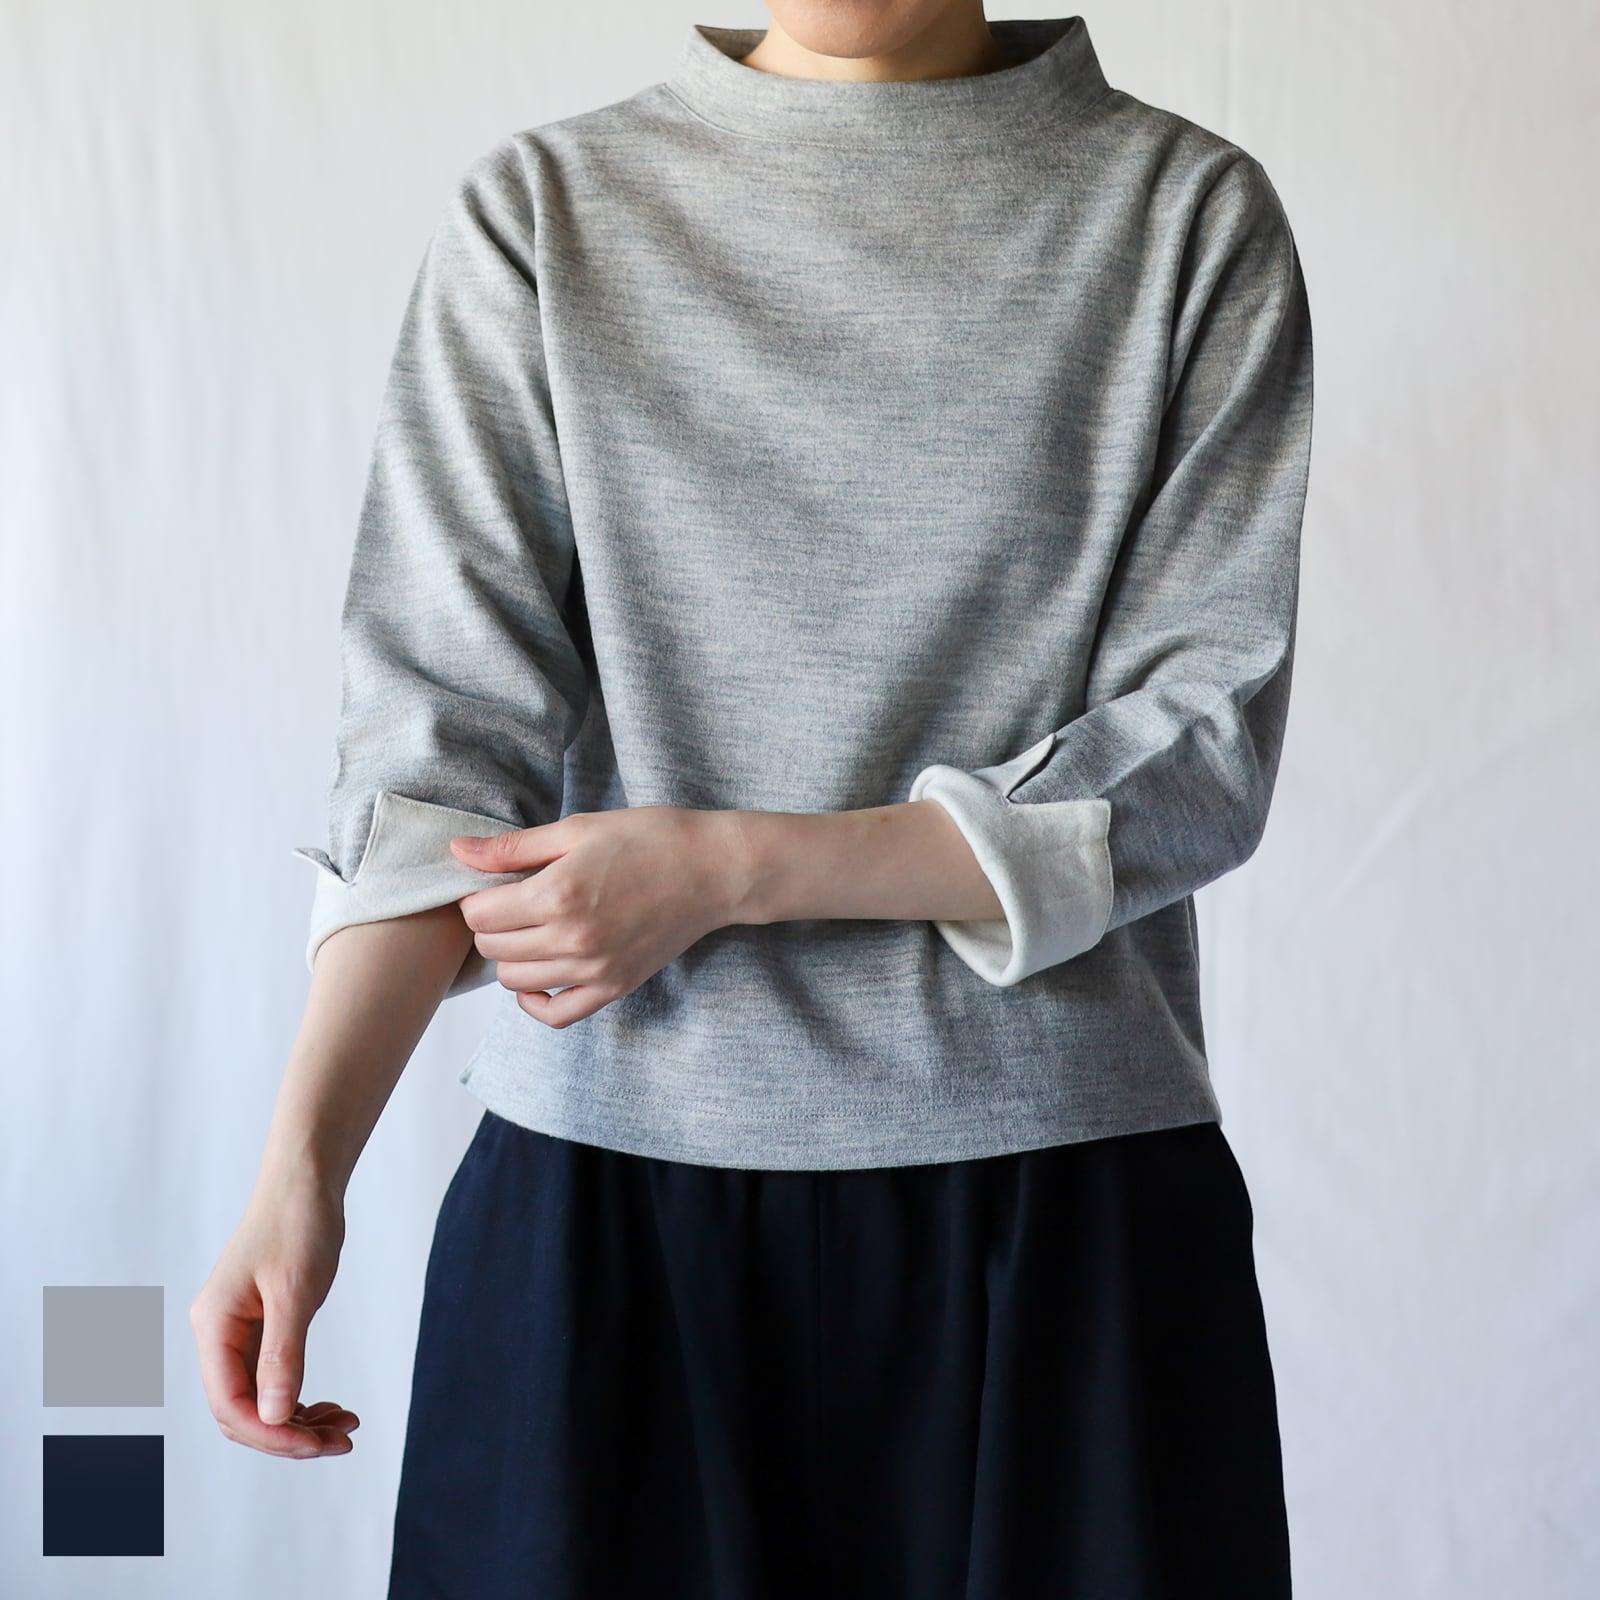 HAND ROOM WOMEN'S - ボトルネック ターンナップ カフスTシャツ - Grey / Navy